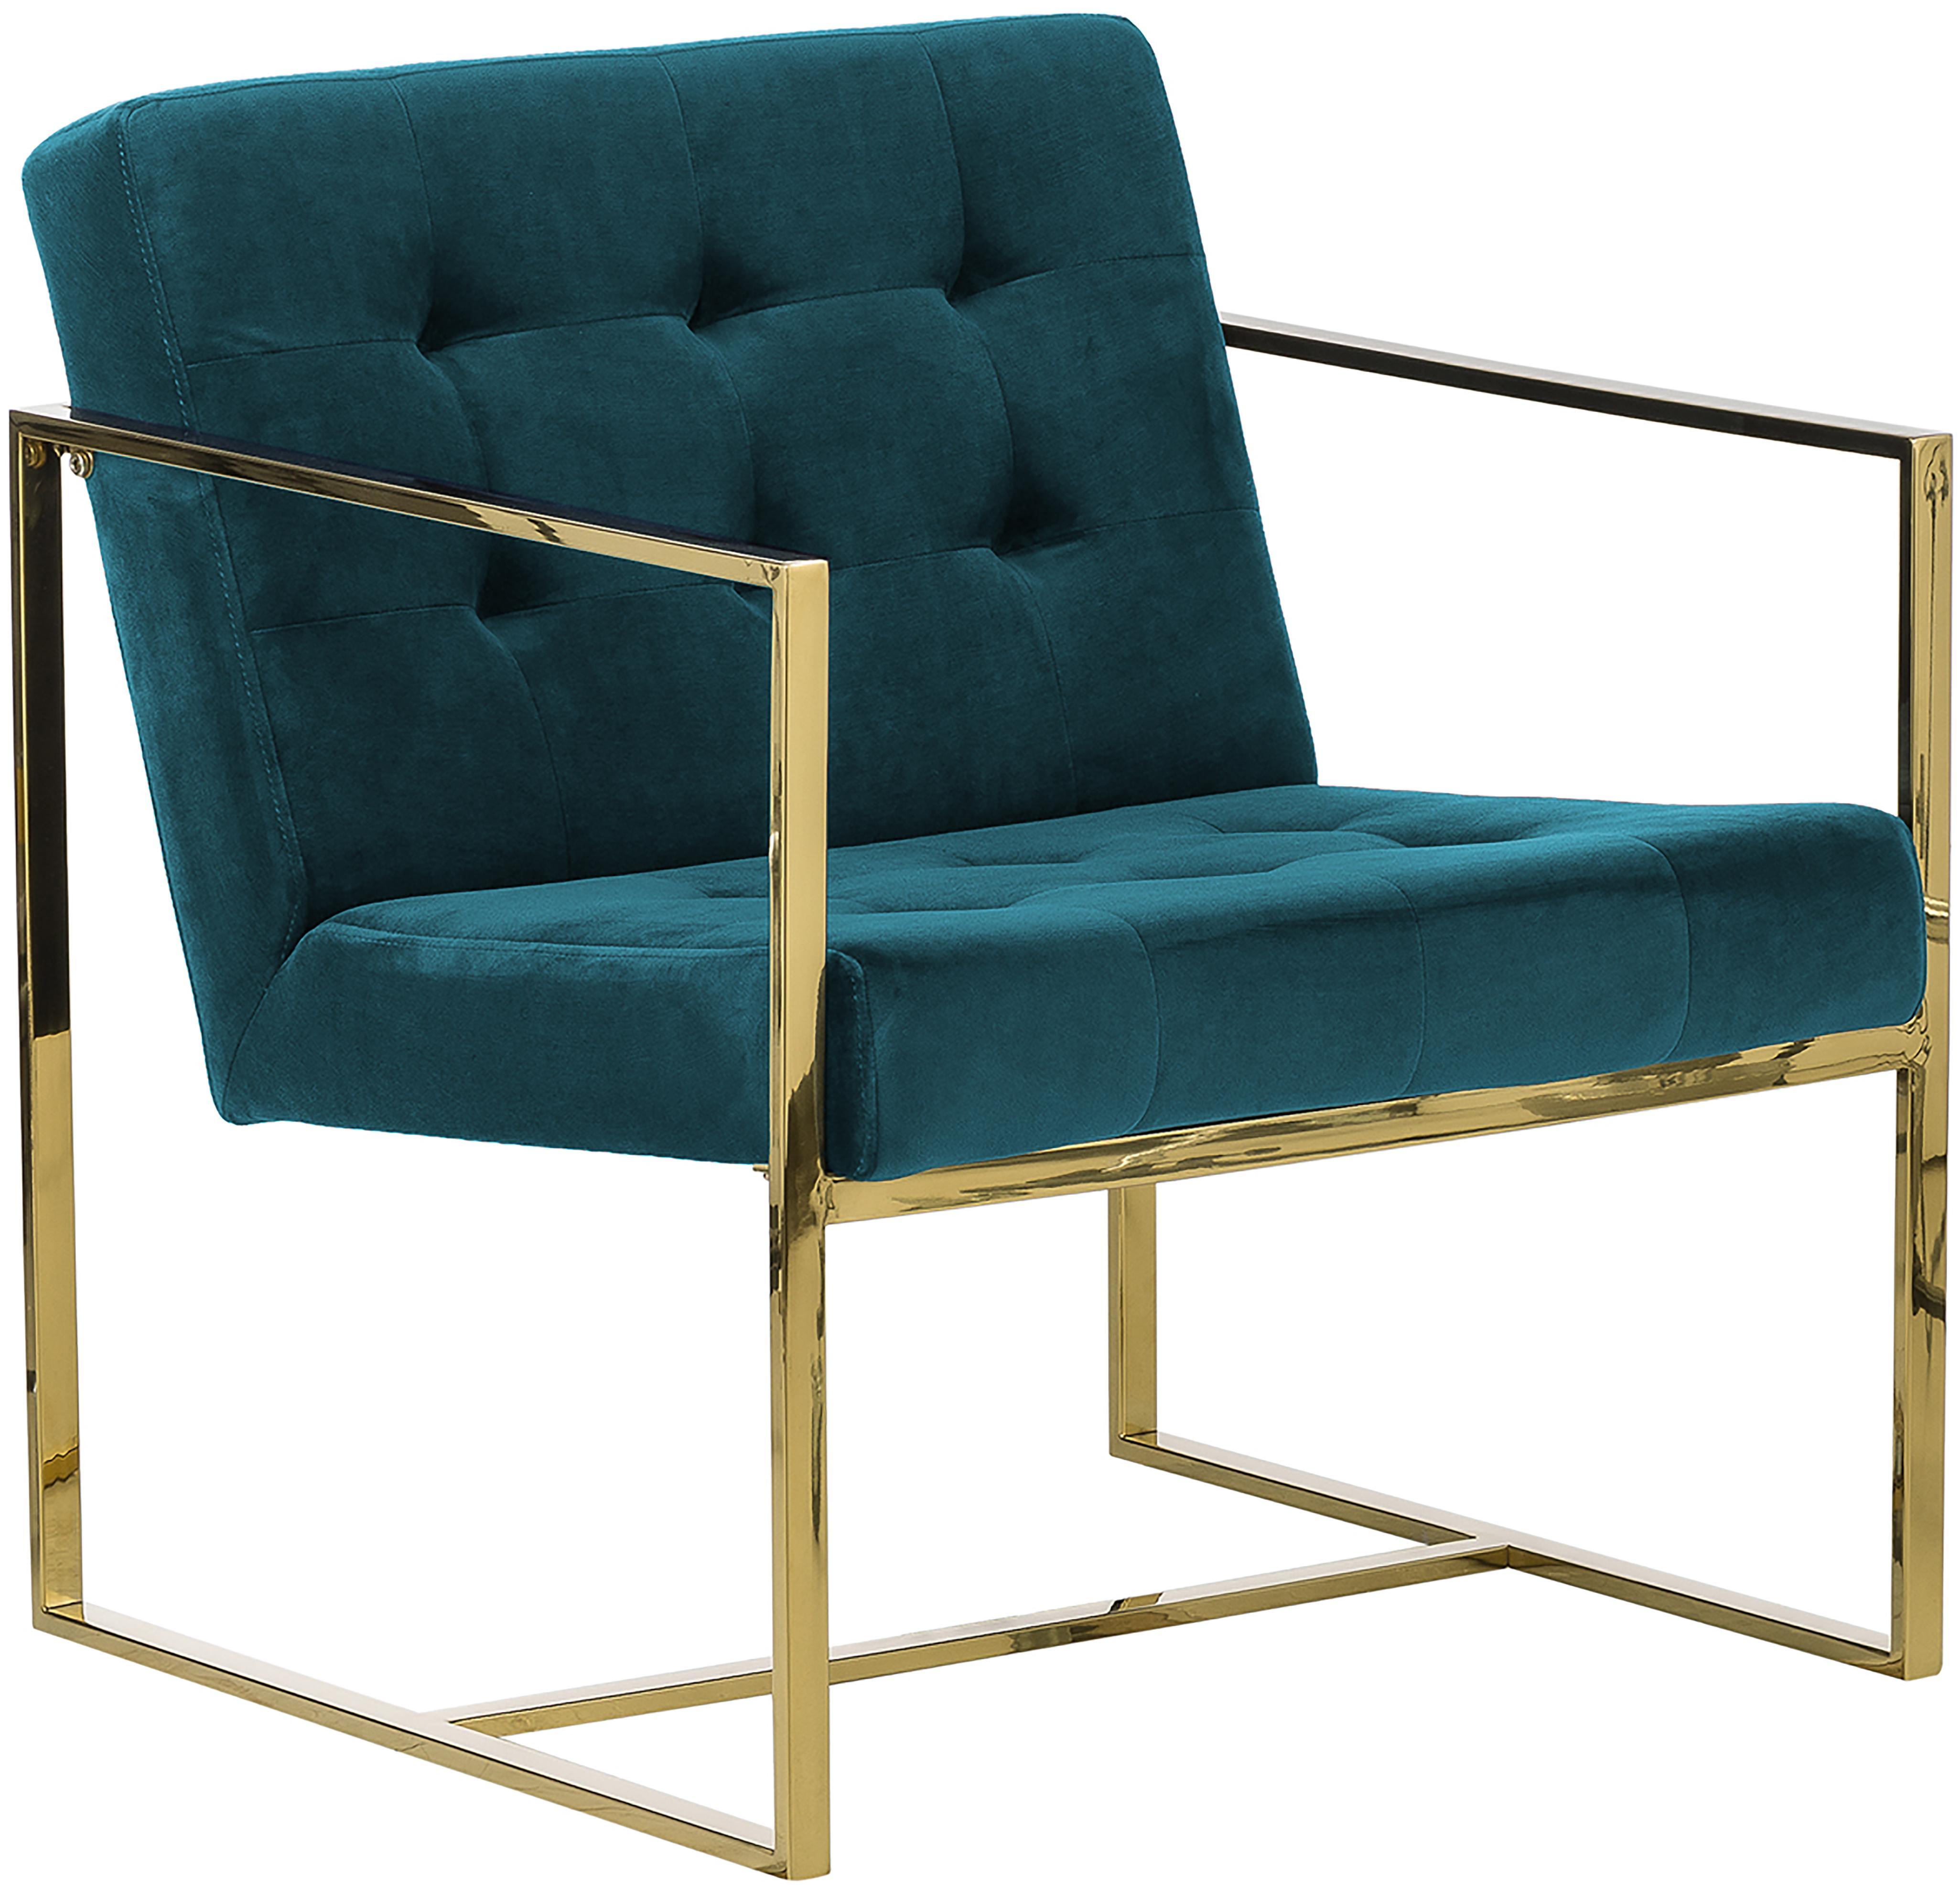 Fluwelen fauteuil Manhattan, Bekleding: fluweel (polyester), Frame: gecoat metaal, Turquoise, B 70 x D 72 cm